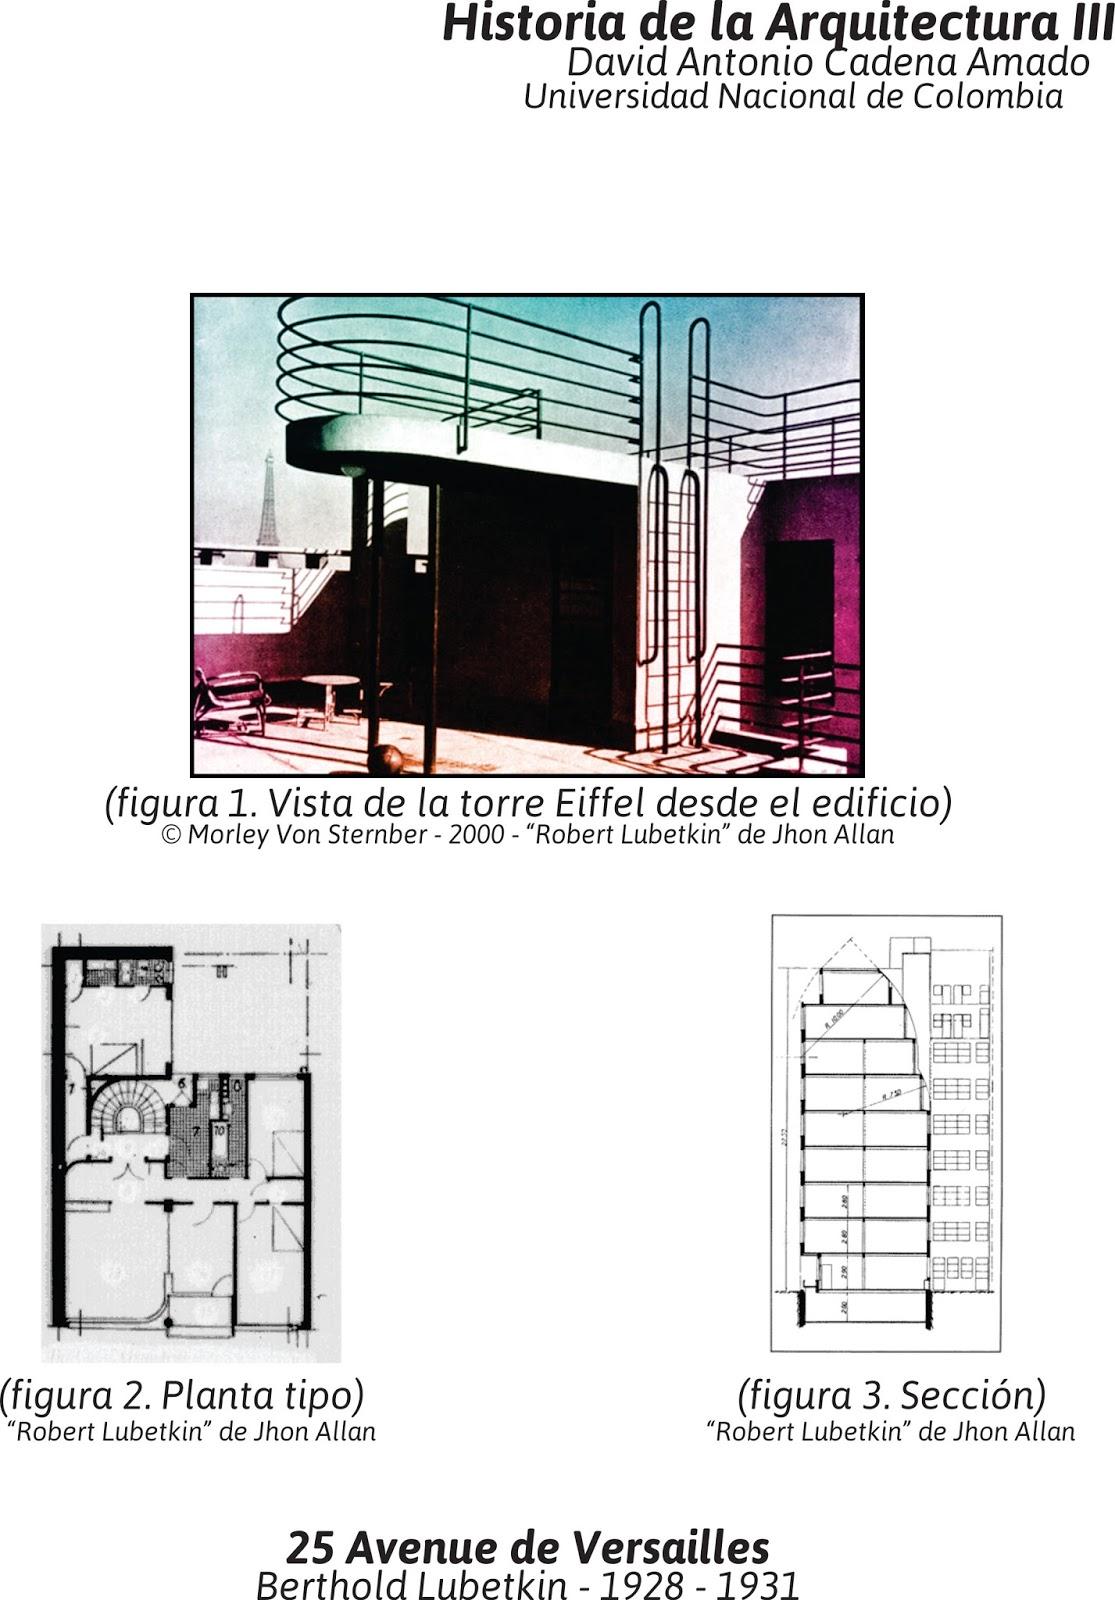 Historia de la arquitectura moderna 25 avenue de for Historia de la arquitectura moderna